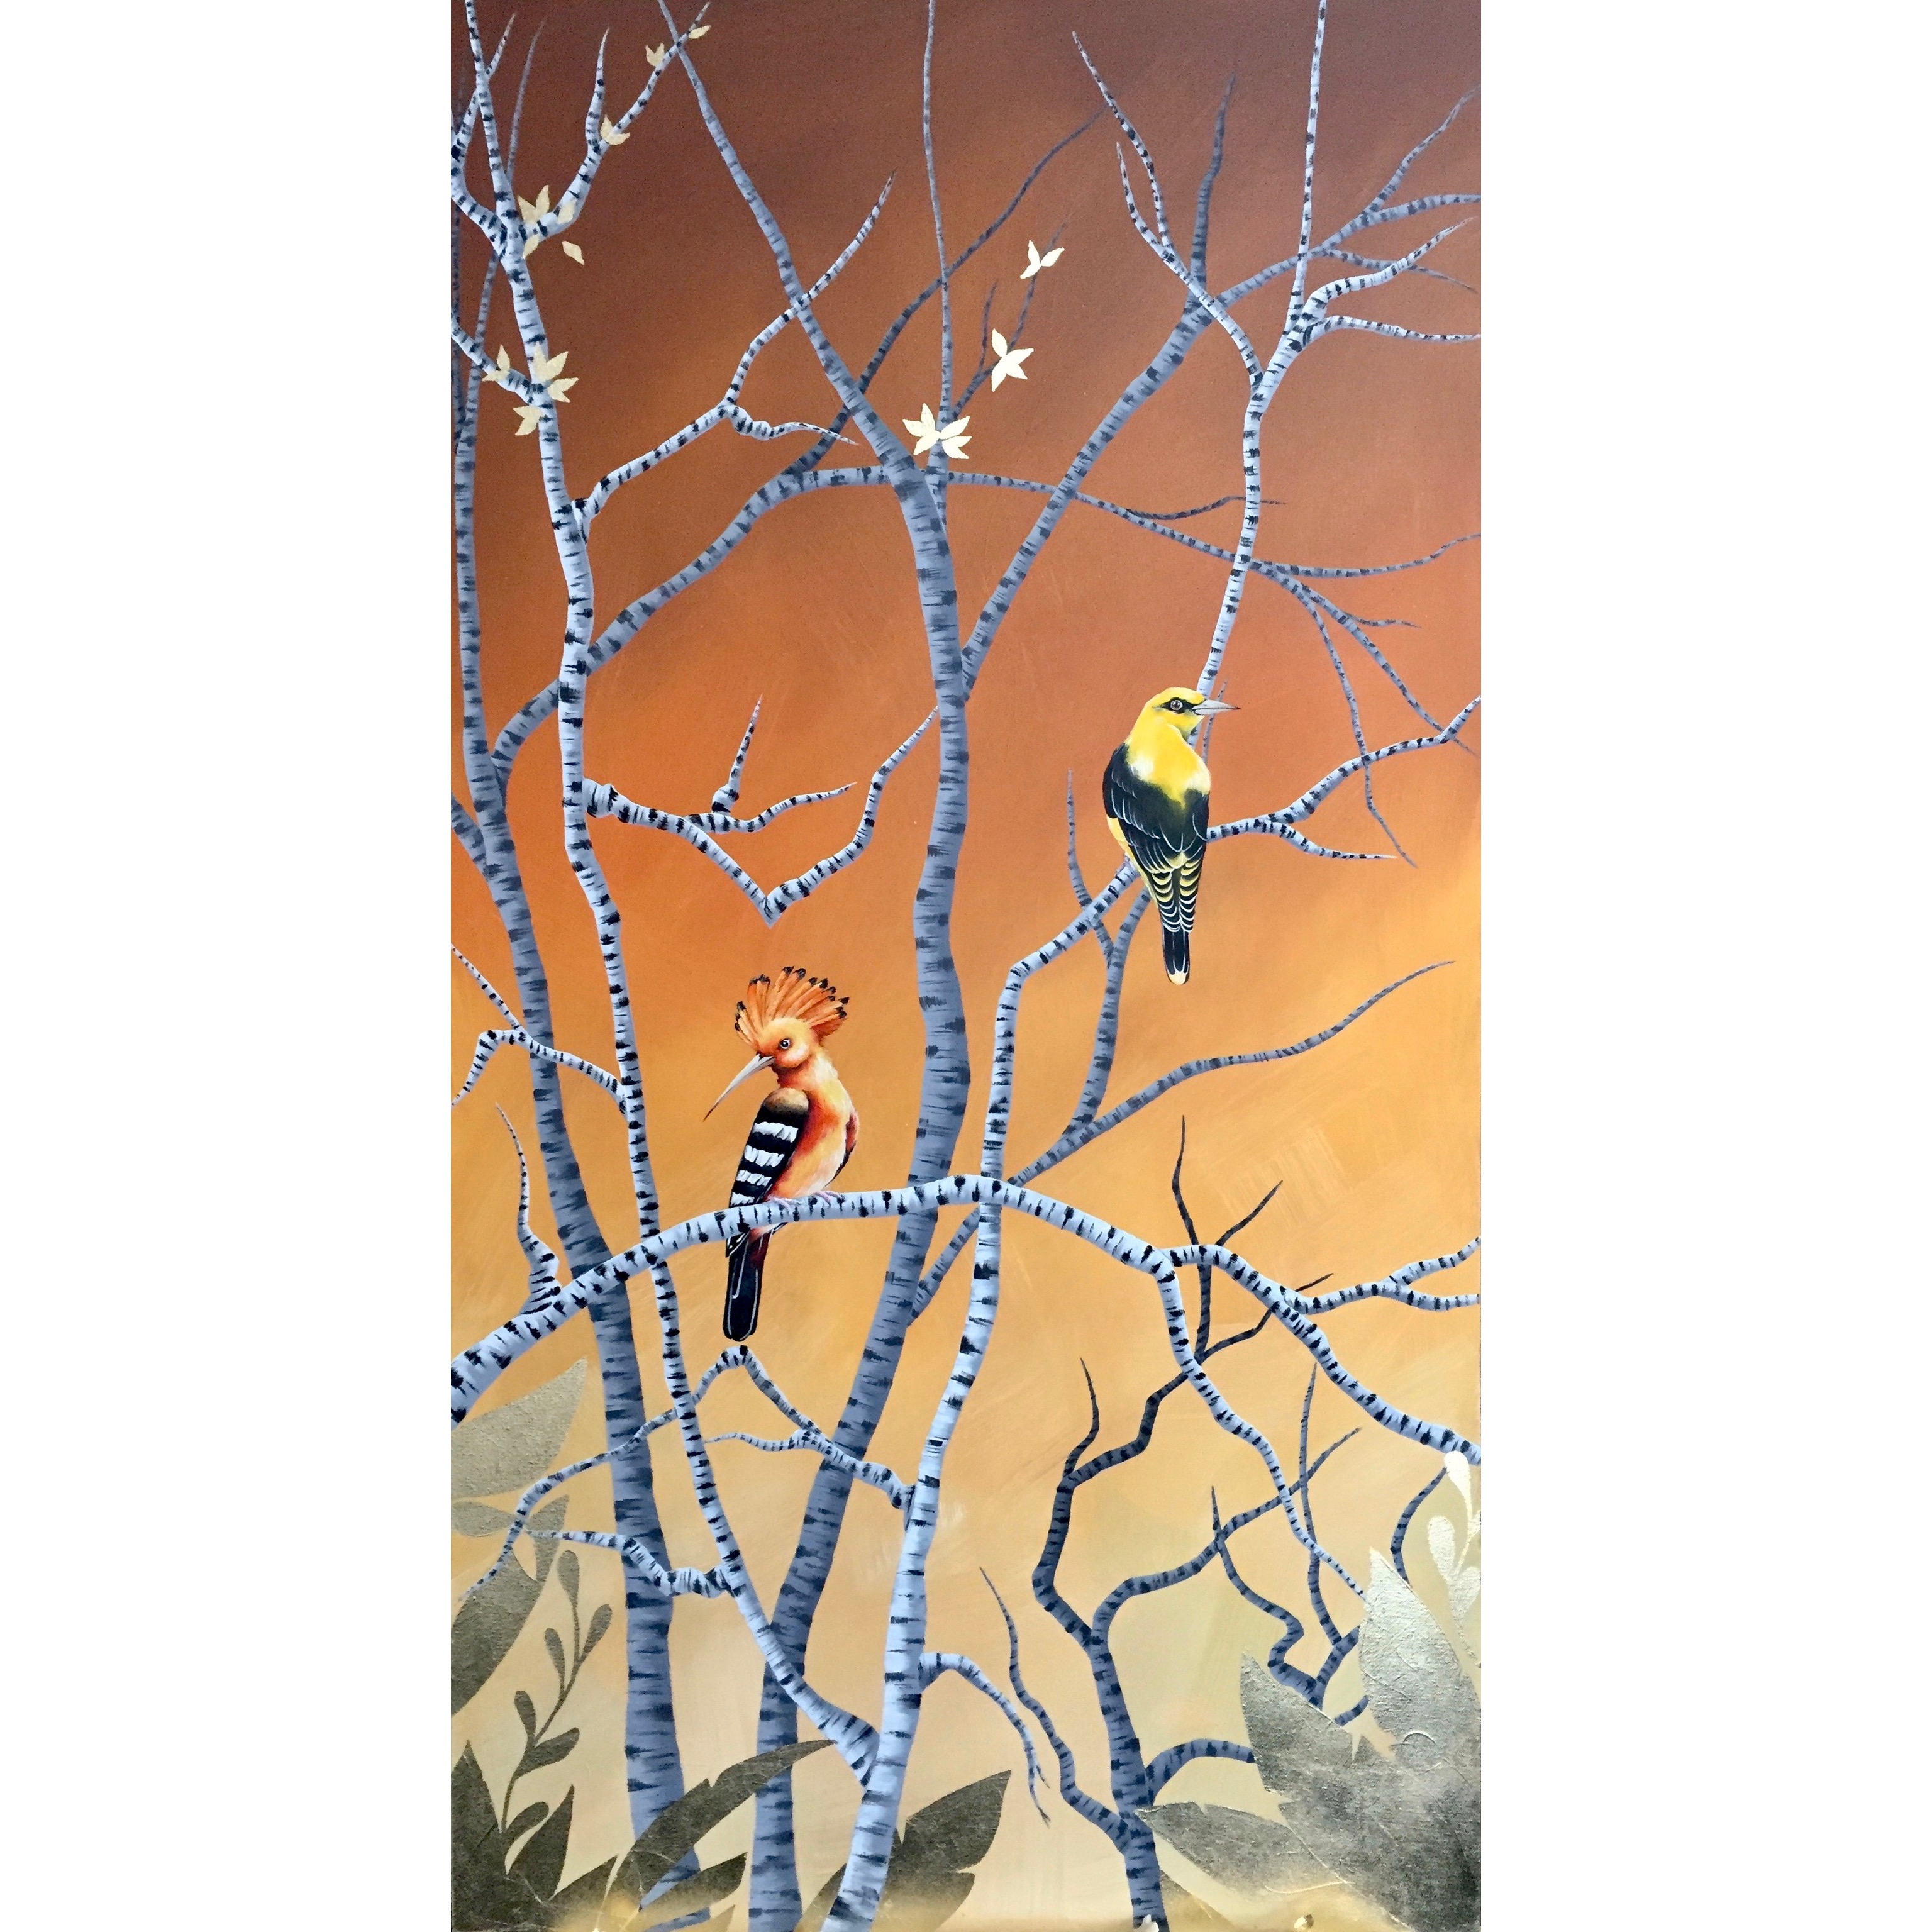 diego-gutierrez-gallery-commissions-sunset-birds-16